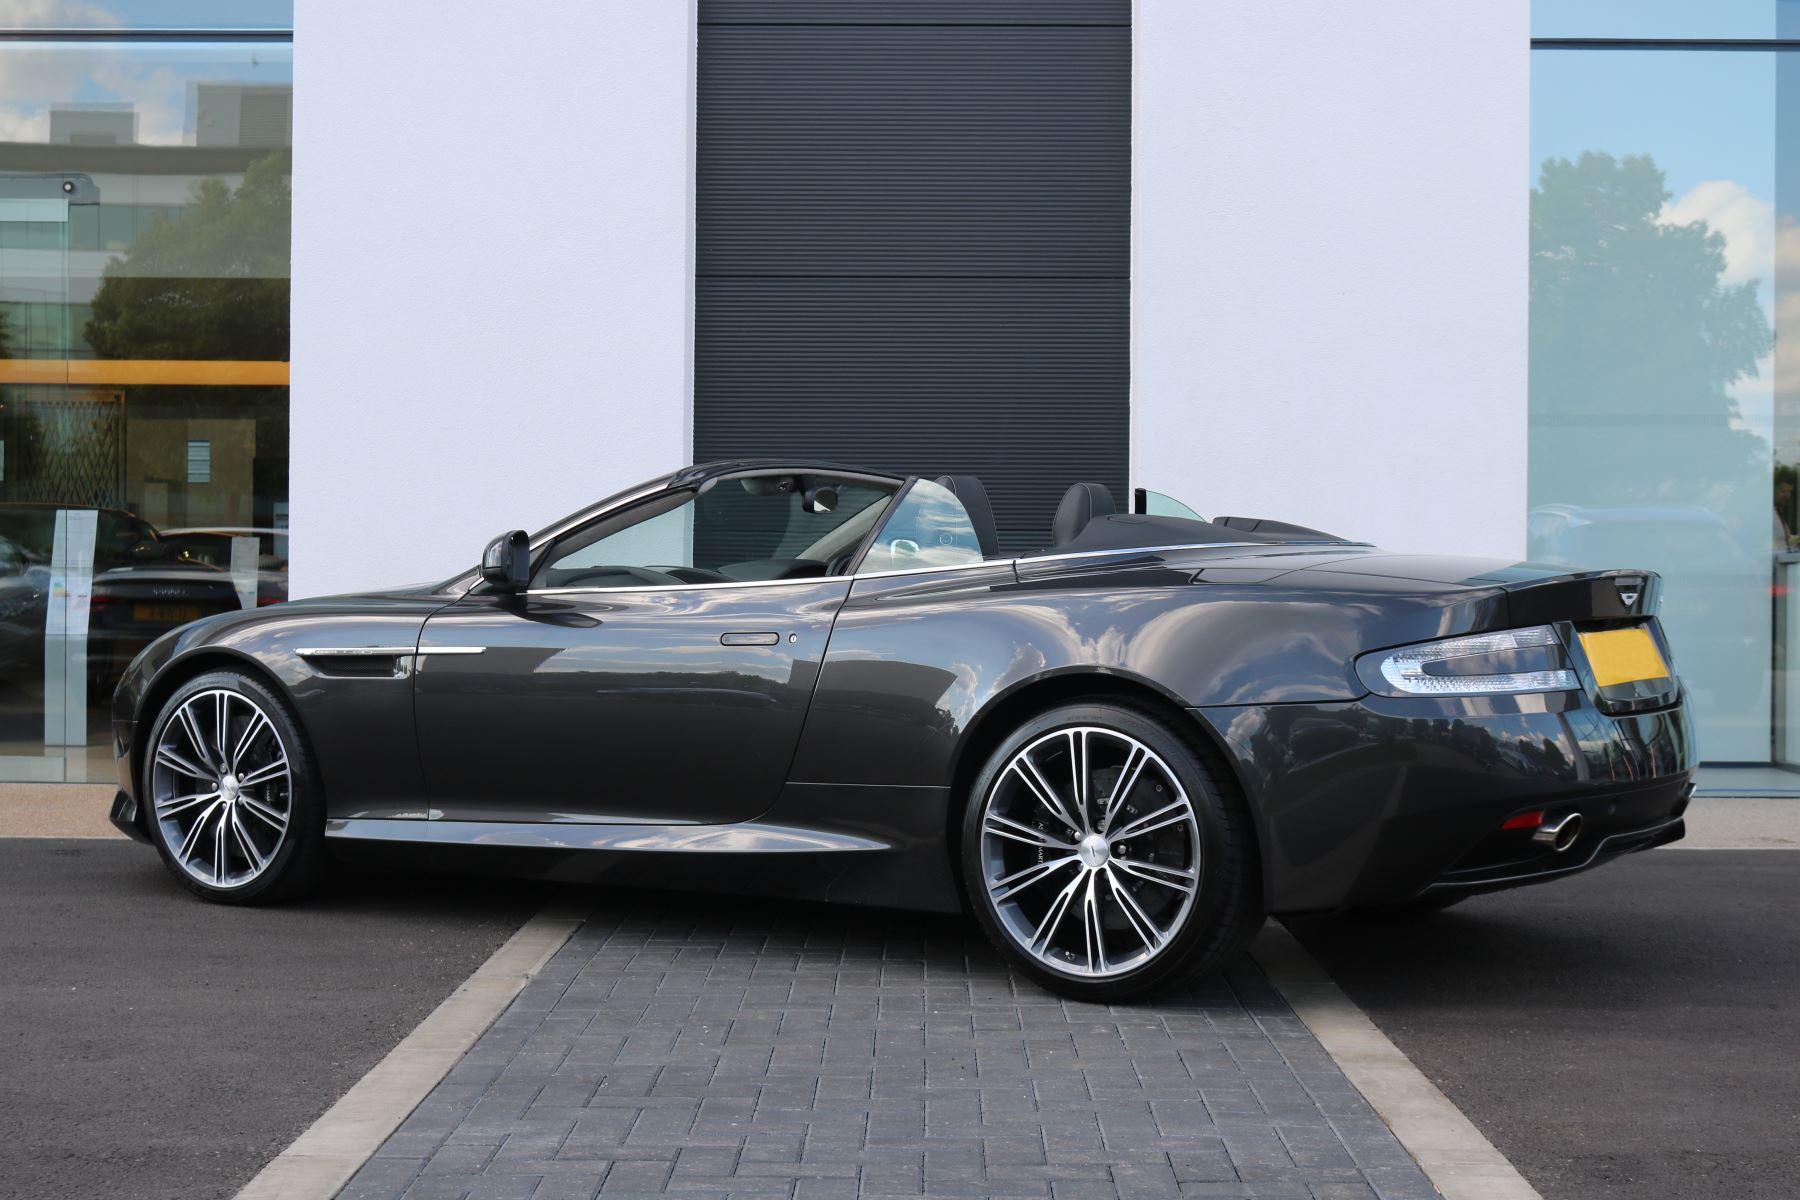 Aston Martin Virage V12 2dr Volante Touchtronic image 4